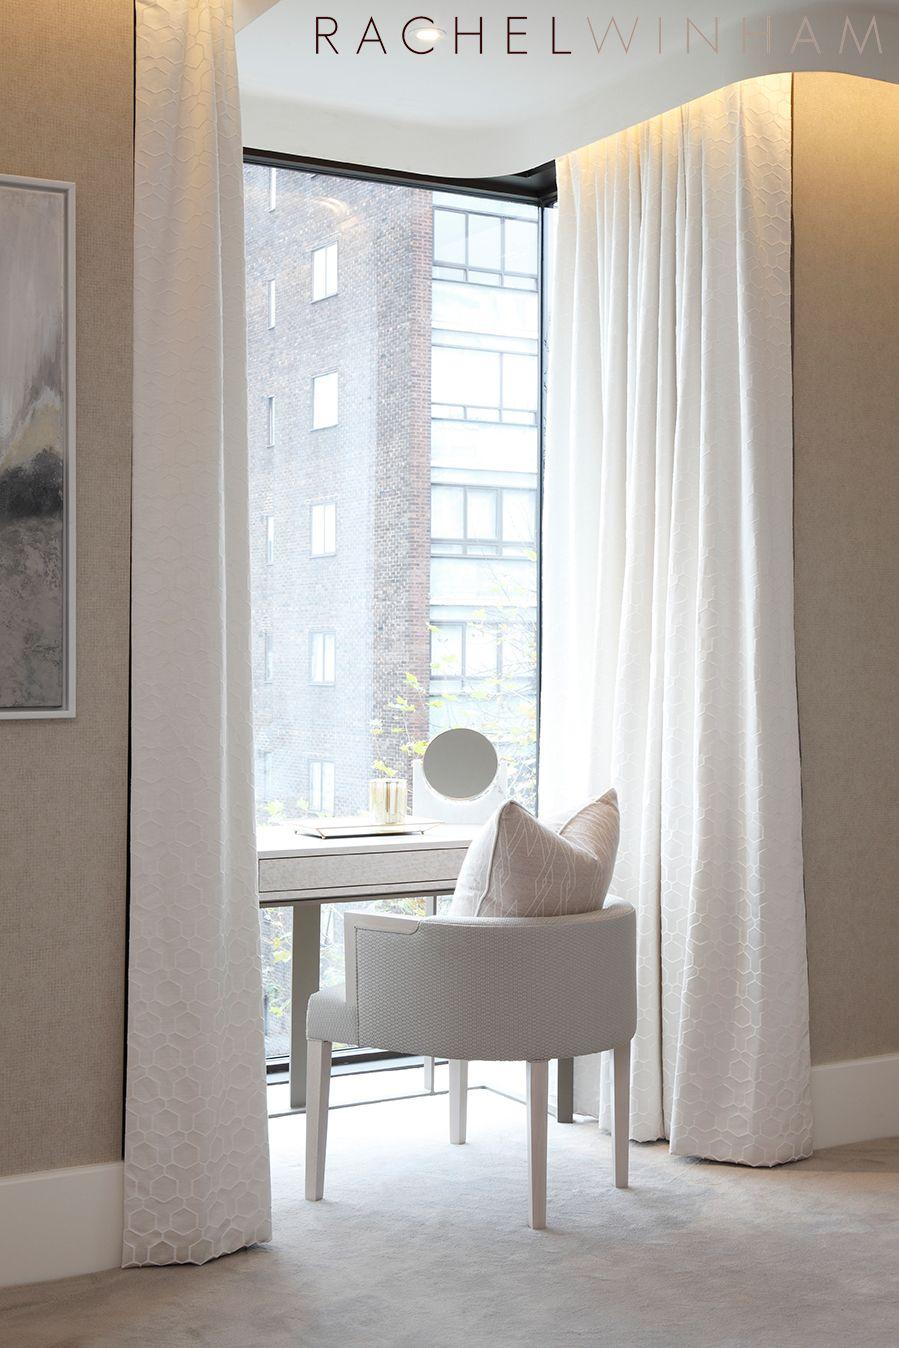 Under window decor  window deskvanity niche framed in light draperies for soft texture